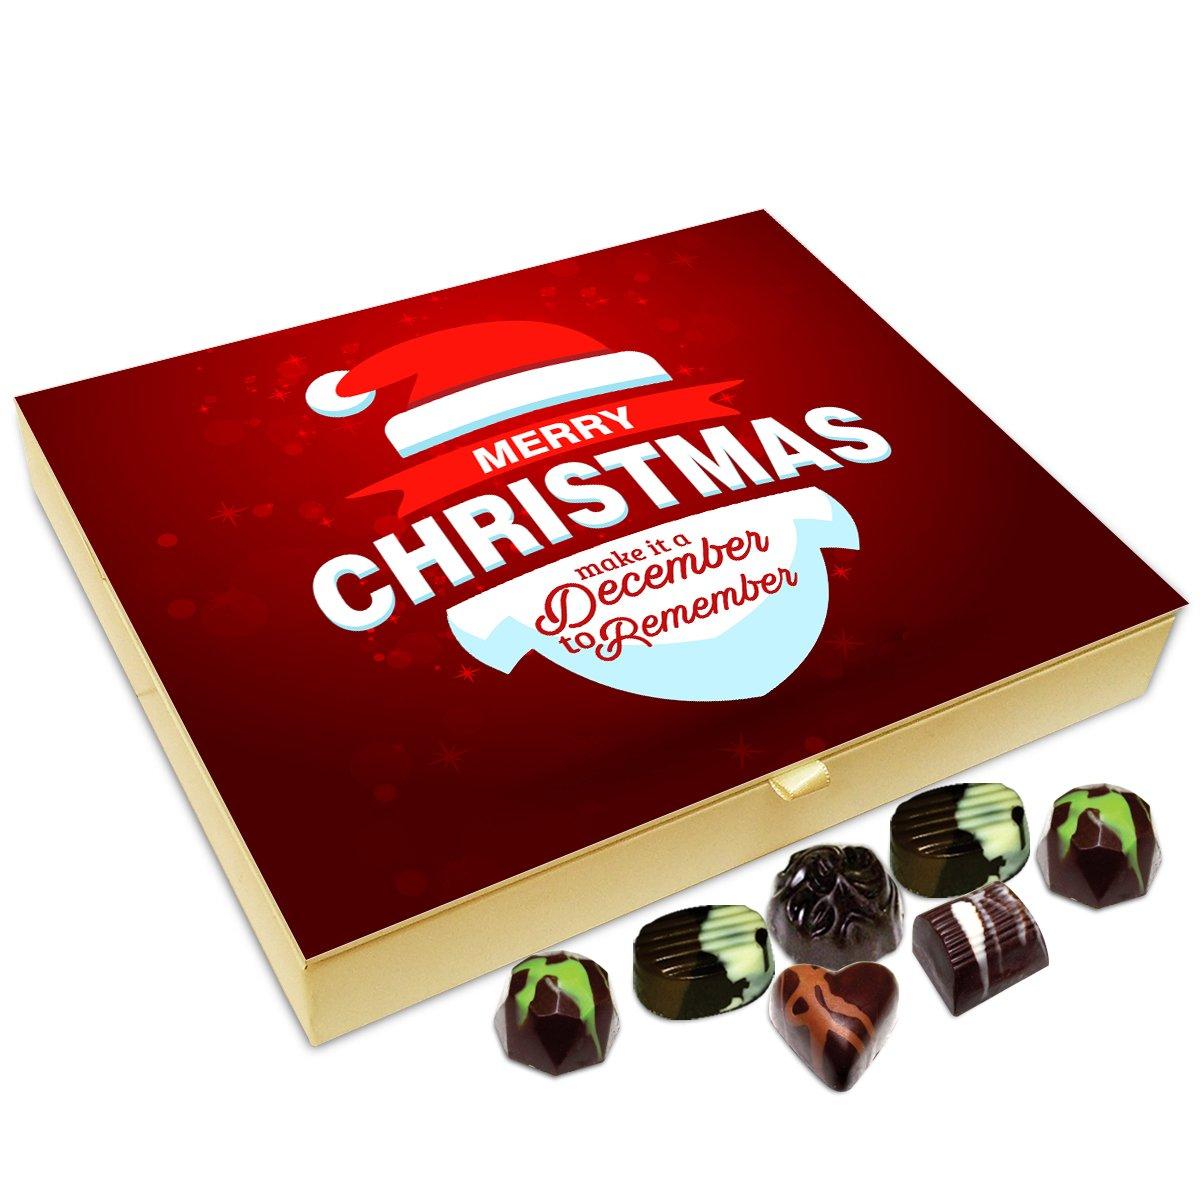 Chocholik Christmas Gift Baox – Merry Christmas Make It A December to Remember Chocolate Box – 20pc